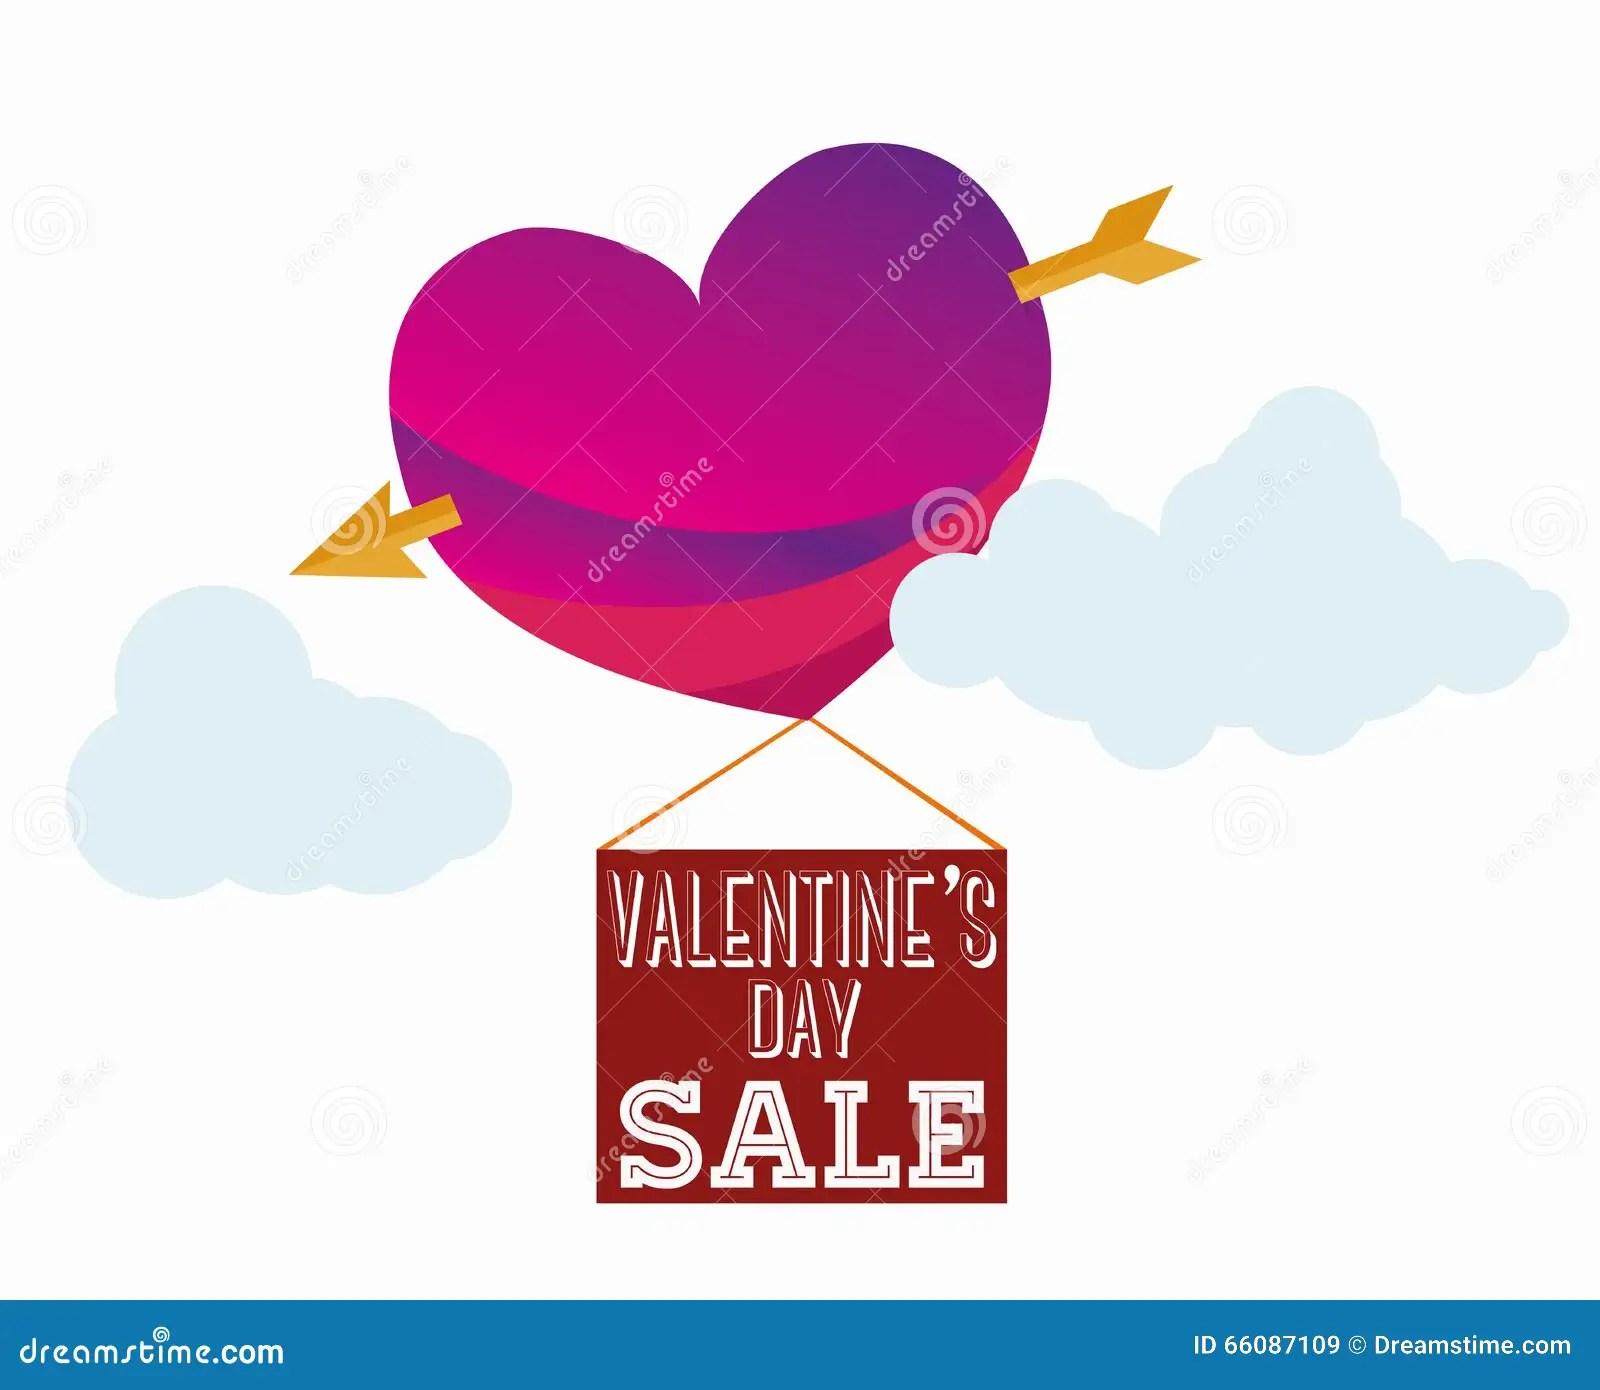 Valentines Sale Stock Vector